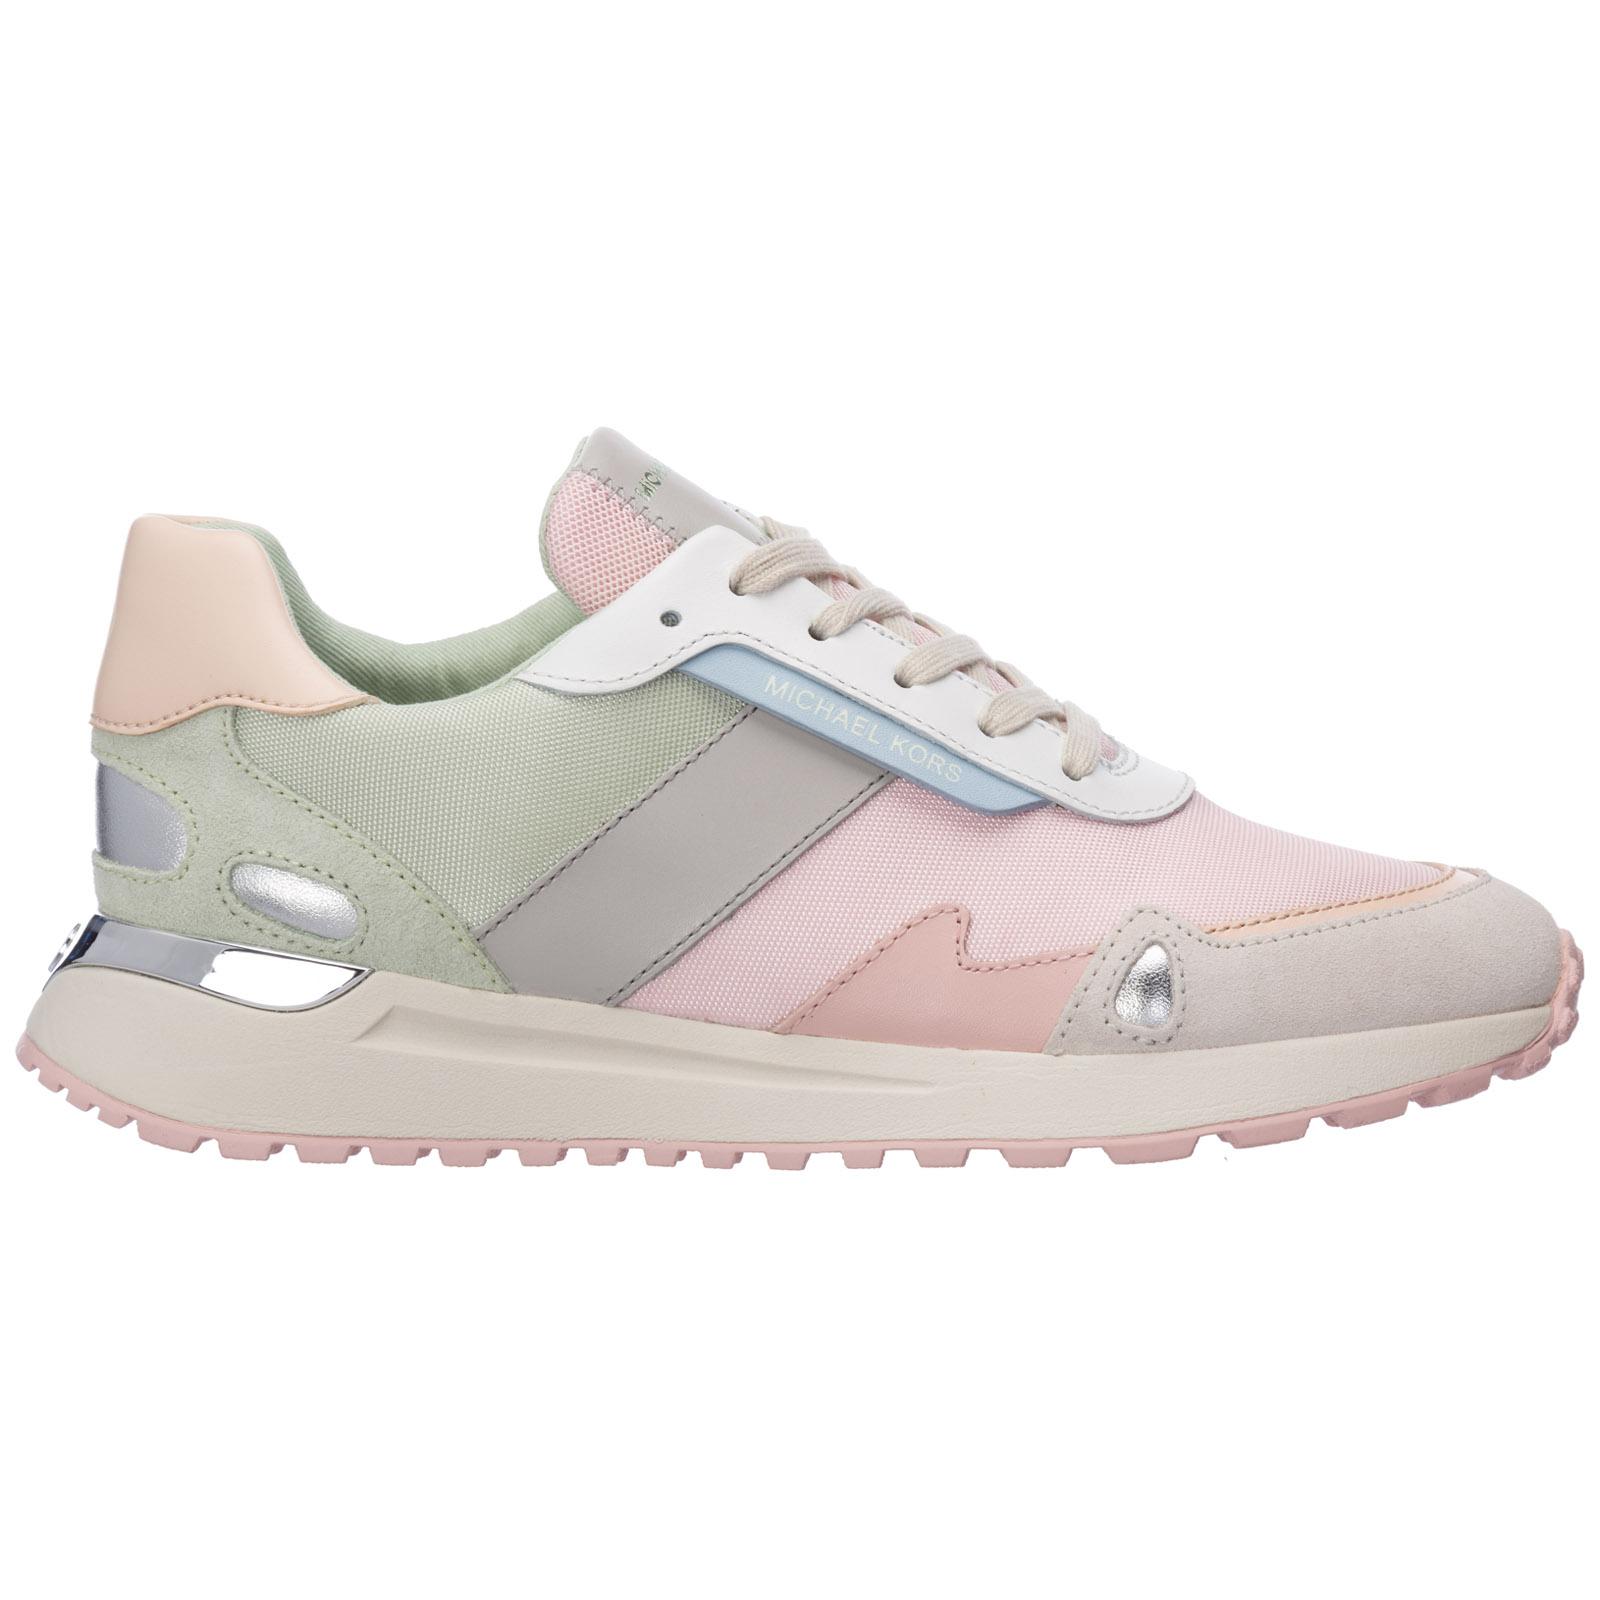 michael kors shoes trainers